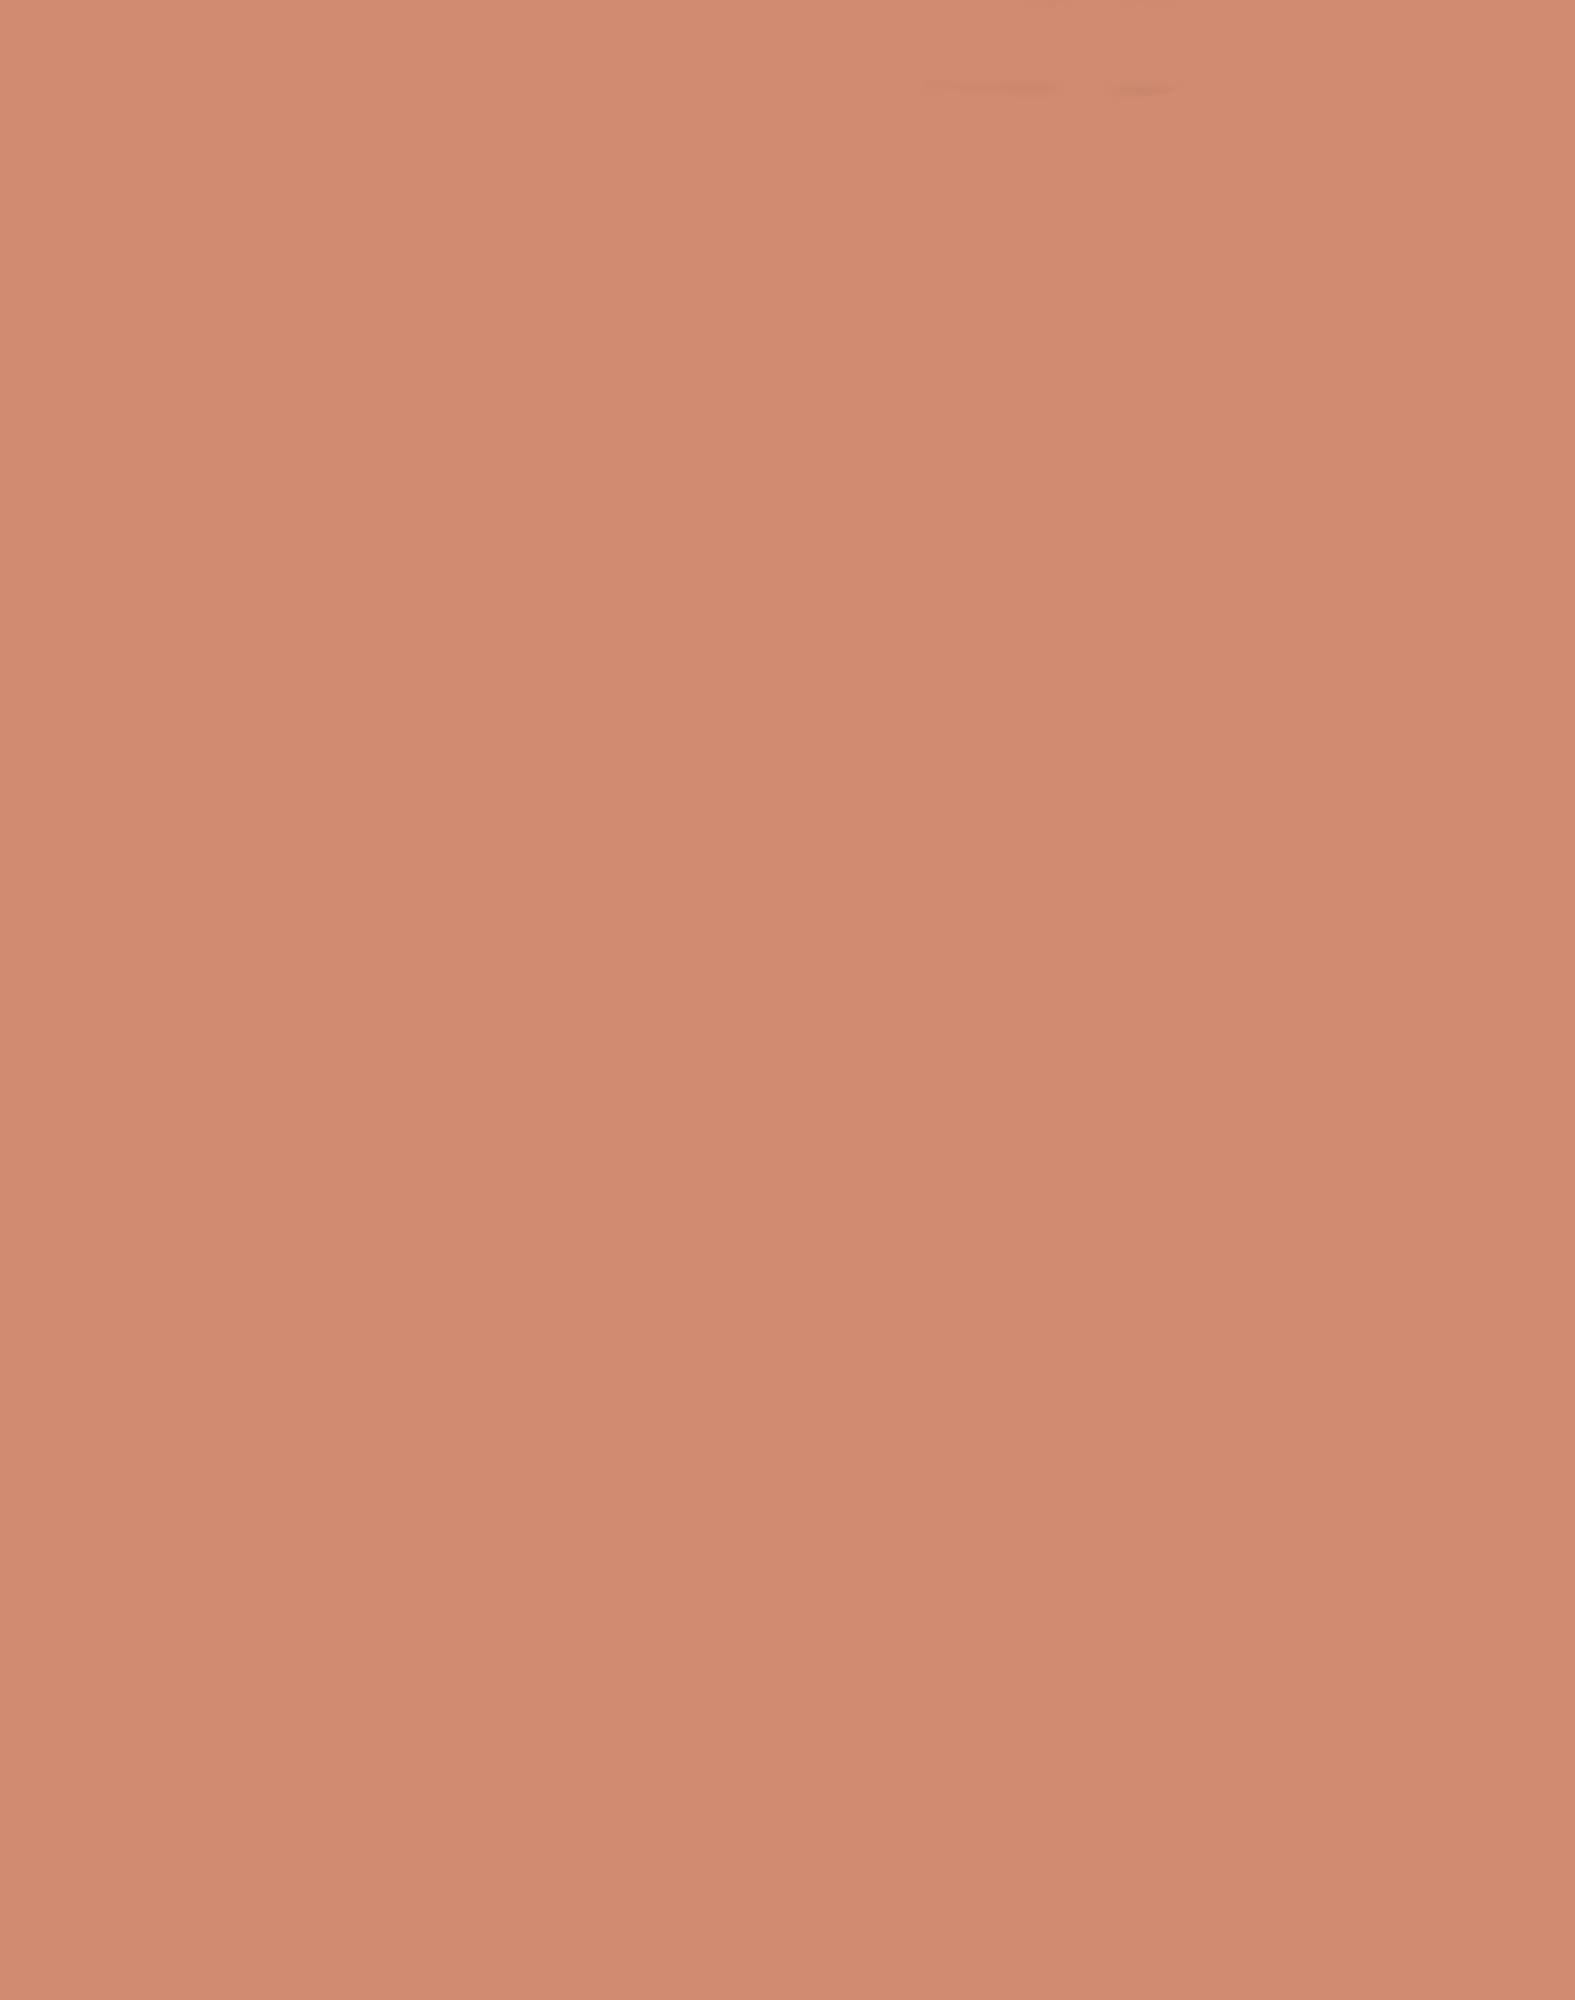 Terracotta 209,139,113